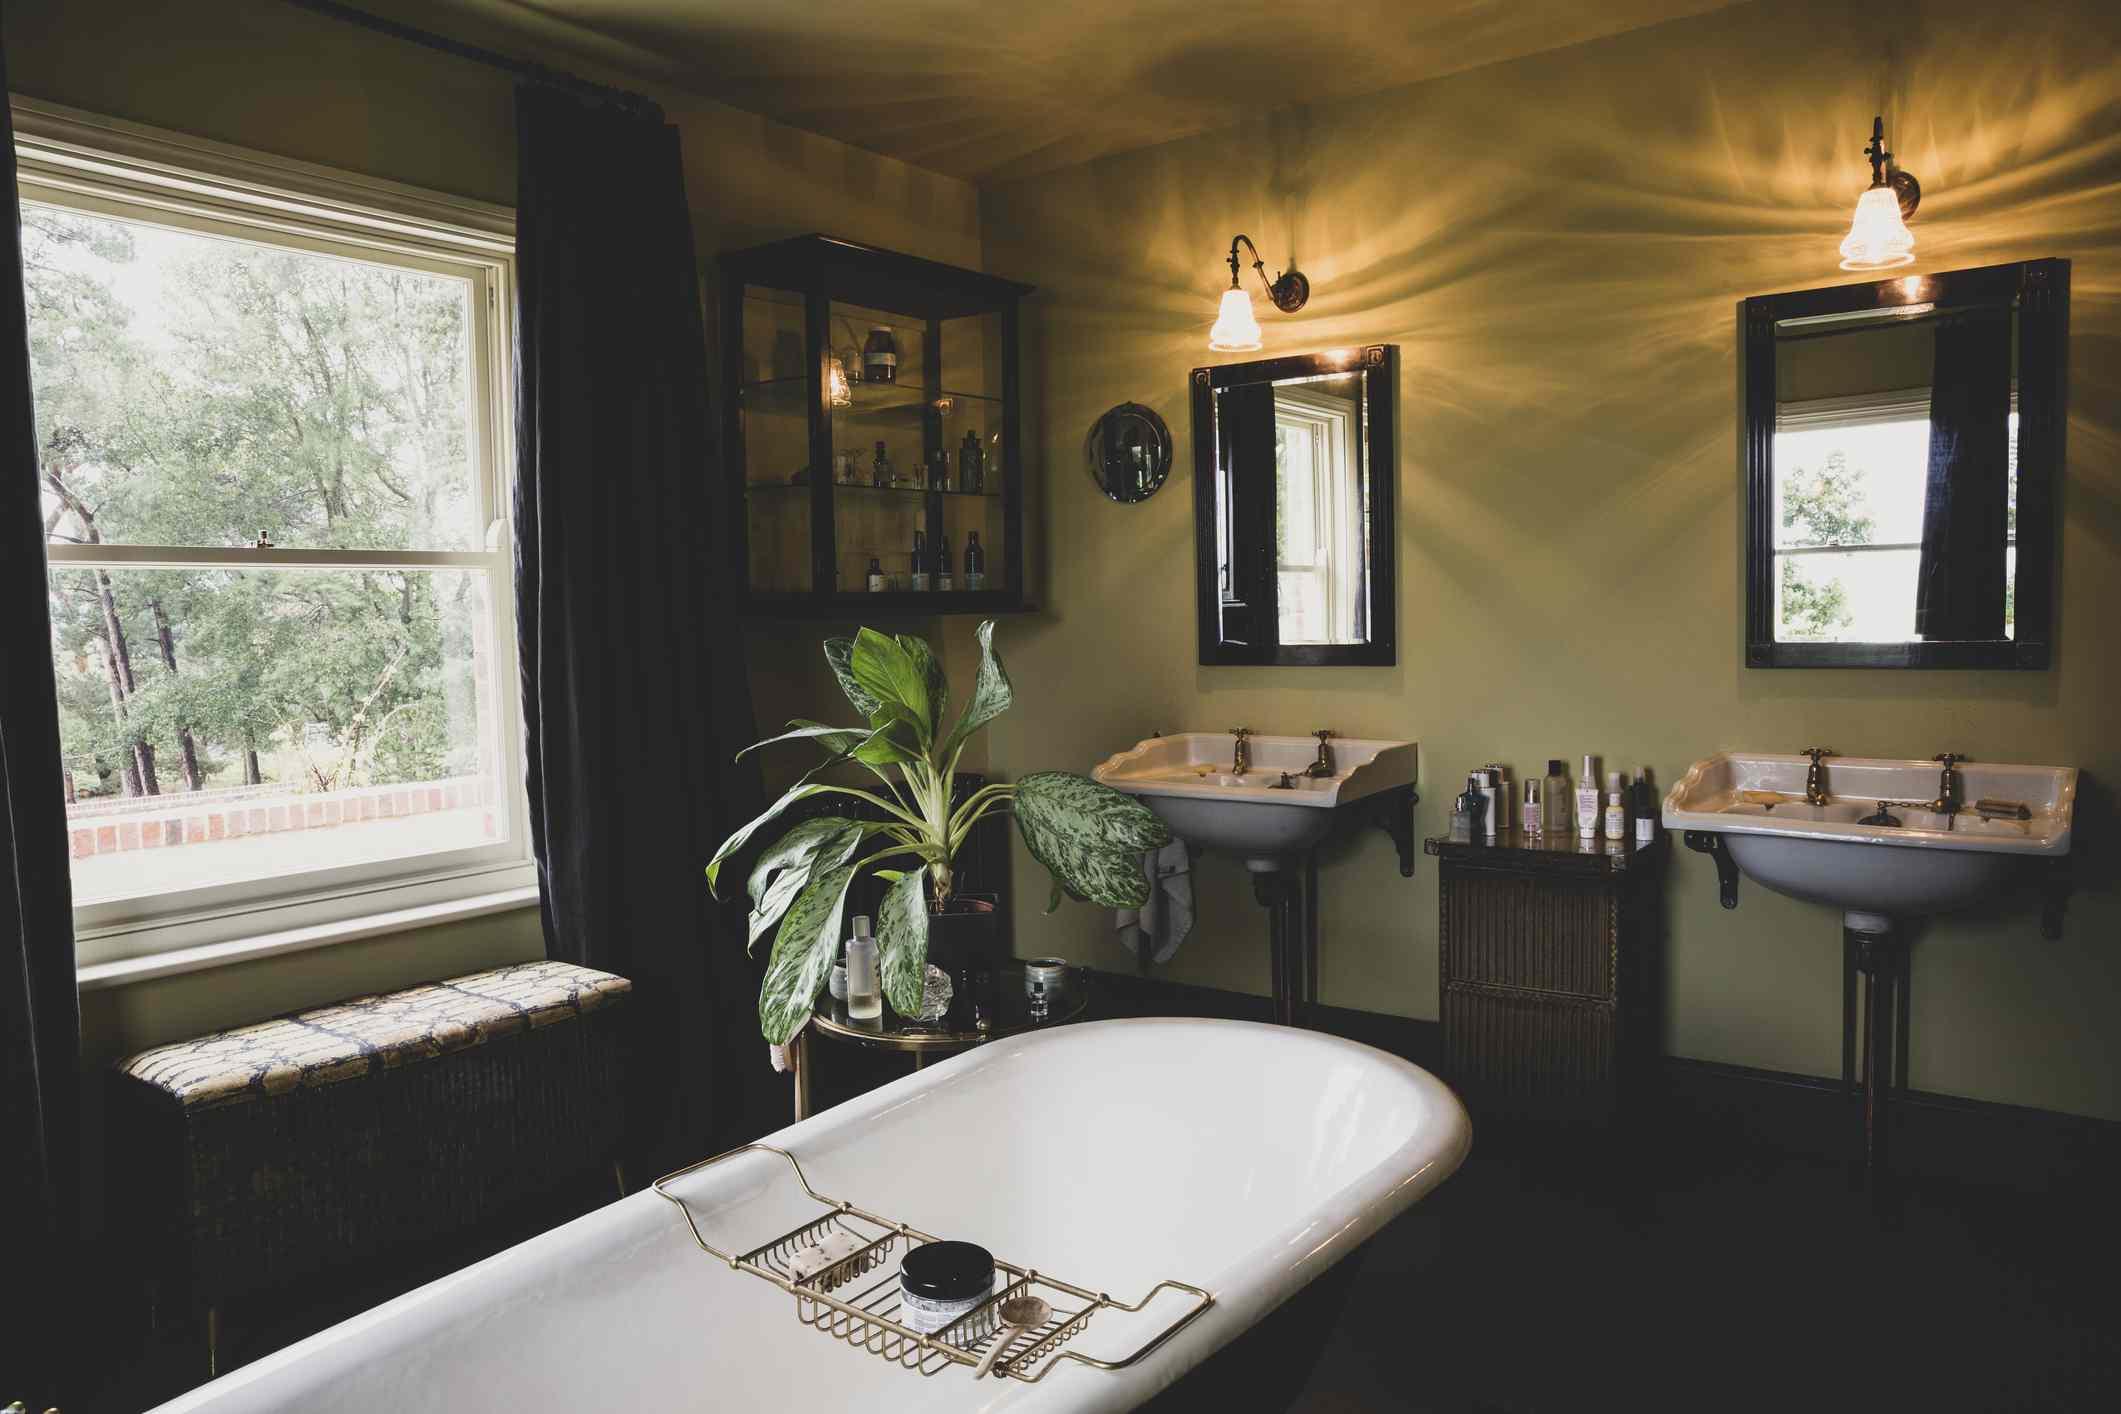 Vintage bathroom with black accents